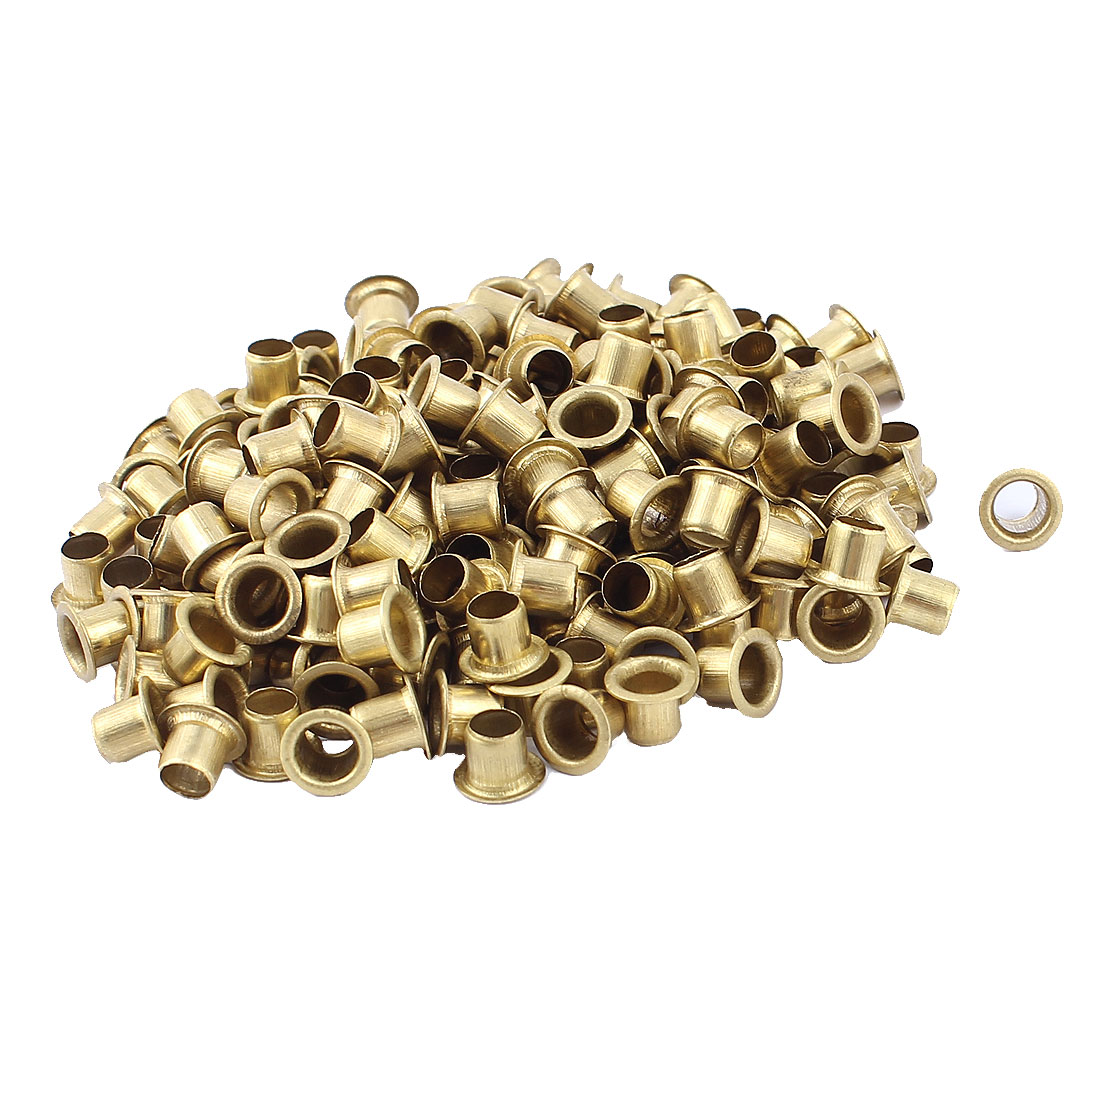 Uxcell 200pcs M6x6 Copper Via Vias Plated Through Hole Rivets Gold Circuit Board Hollow Grommets Pcb